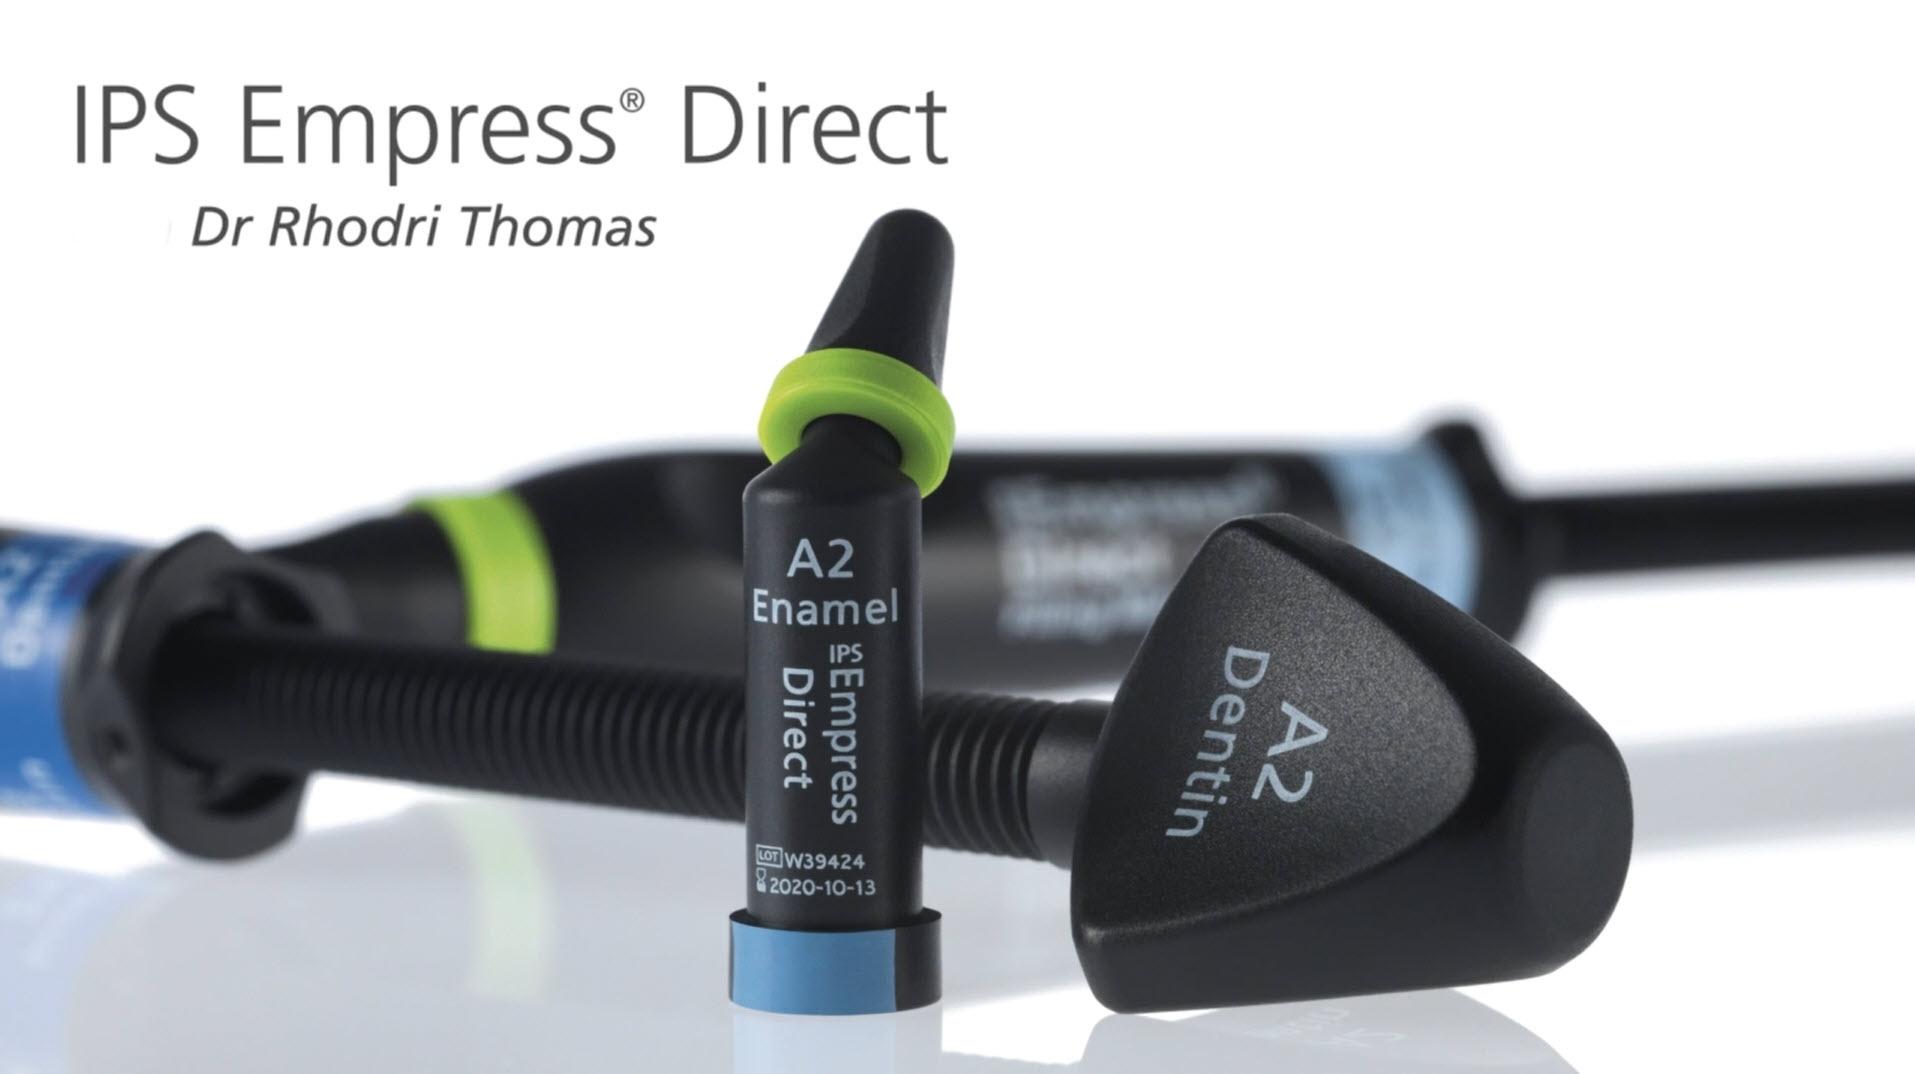 102_ZA_IPS Empress Direct_Interview_Dr. Rhodri Thomas_FR_720p